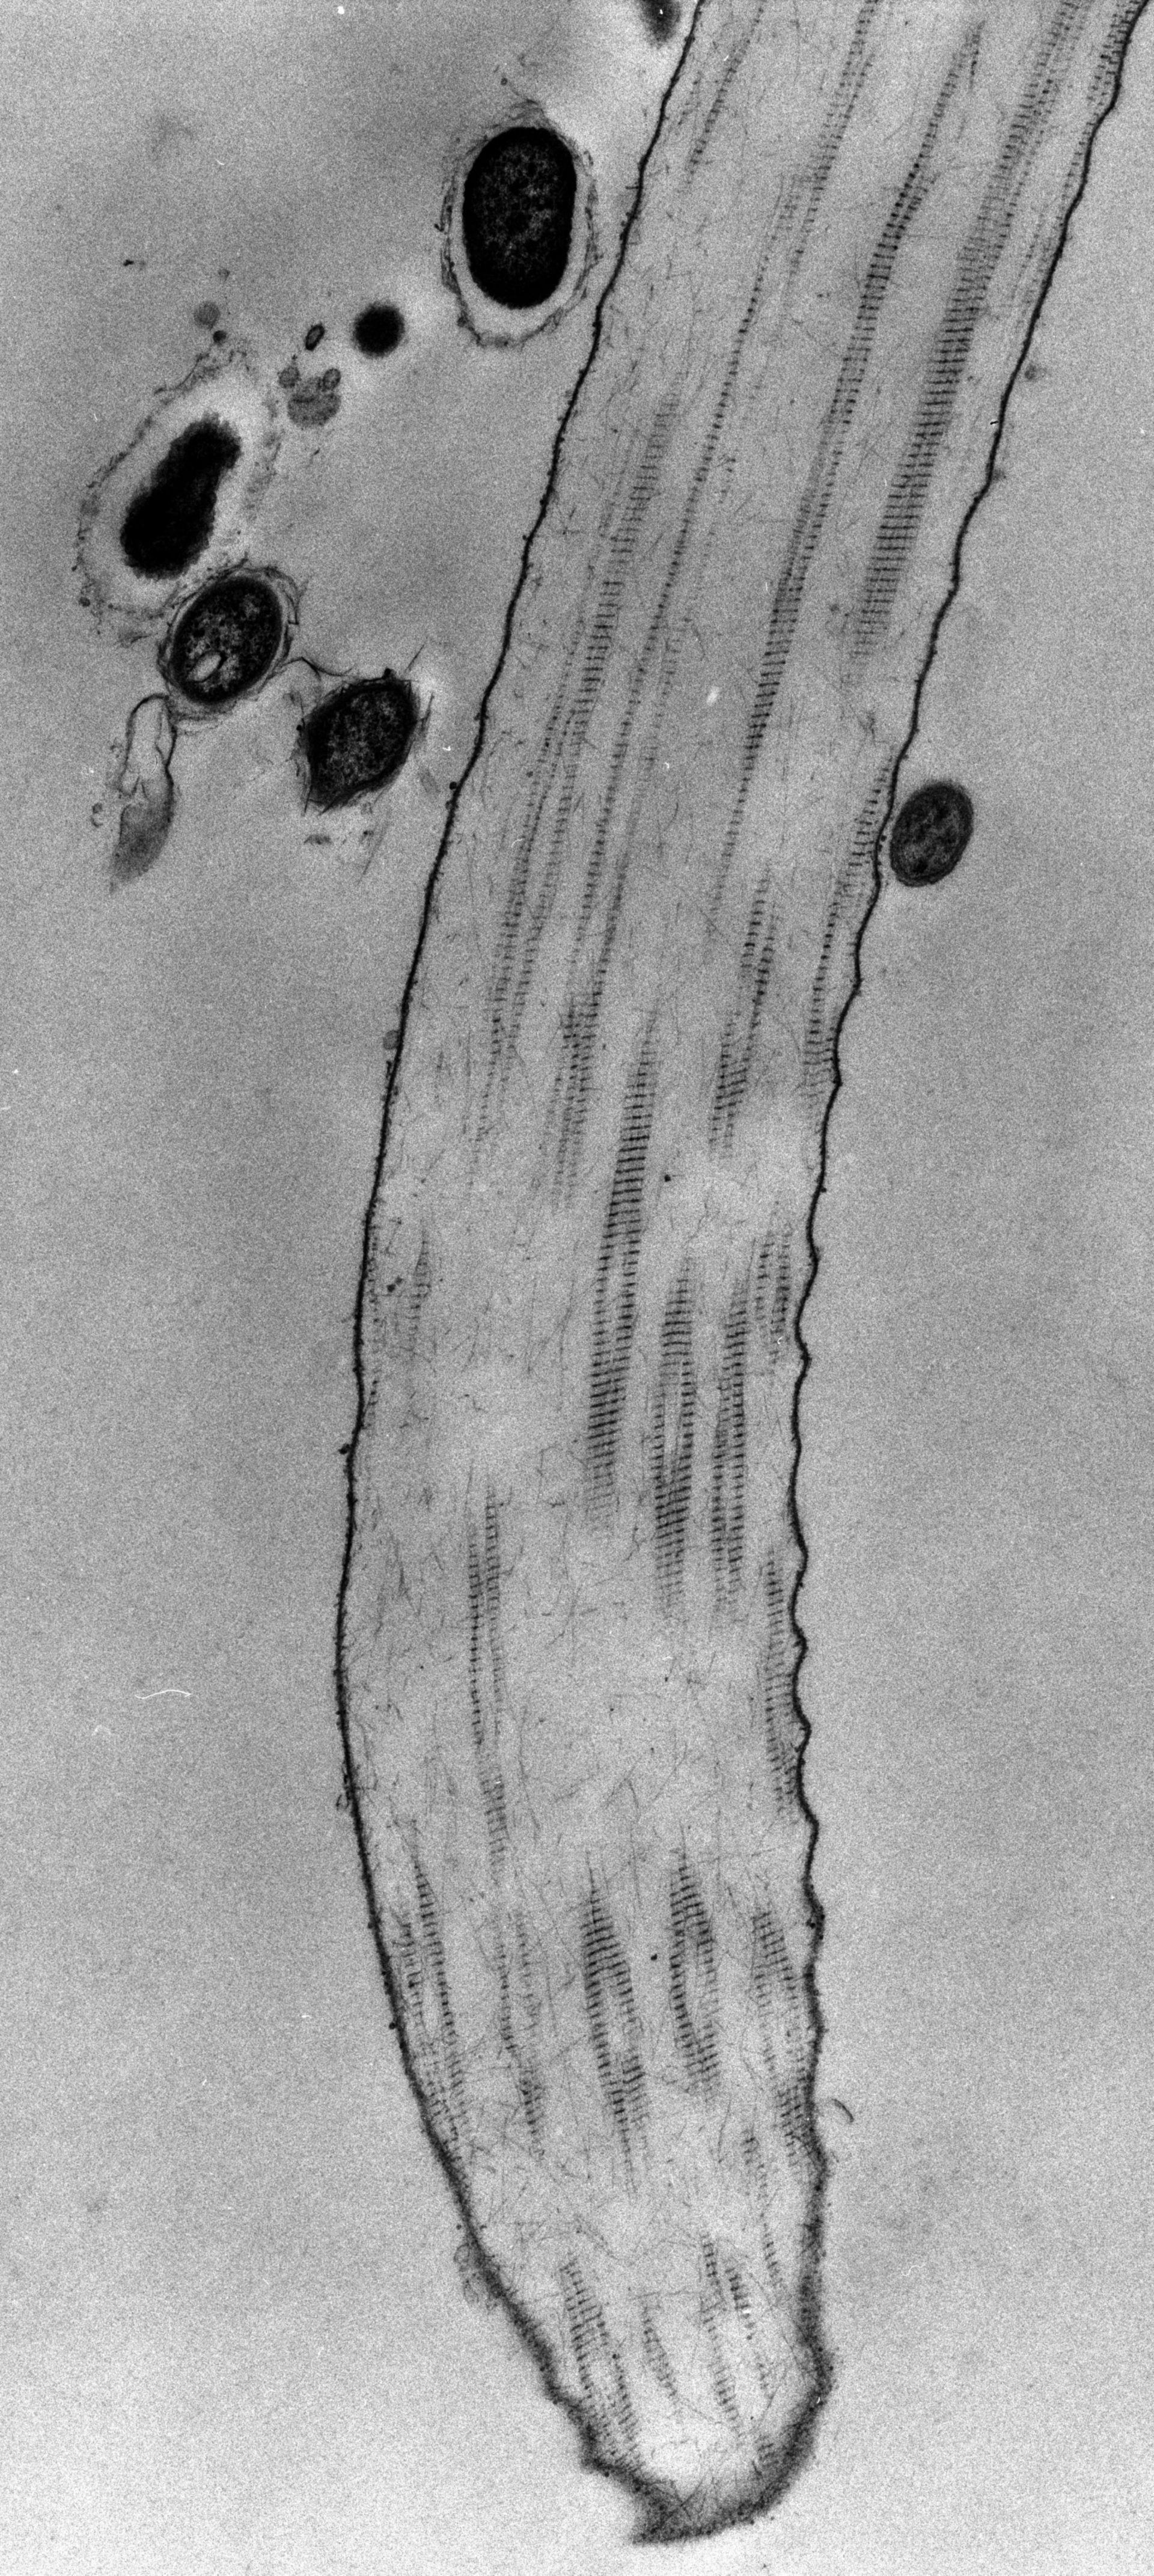 Opercularia coarctata (Fibrille) - CIL:39169